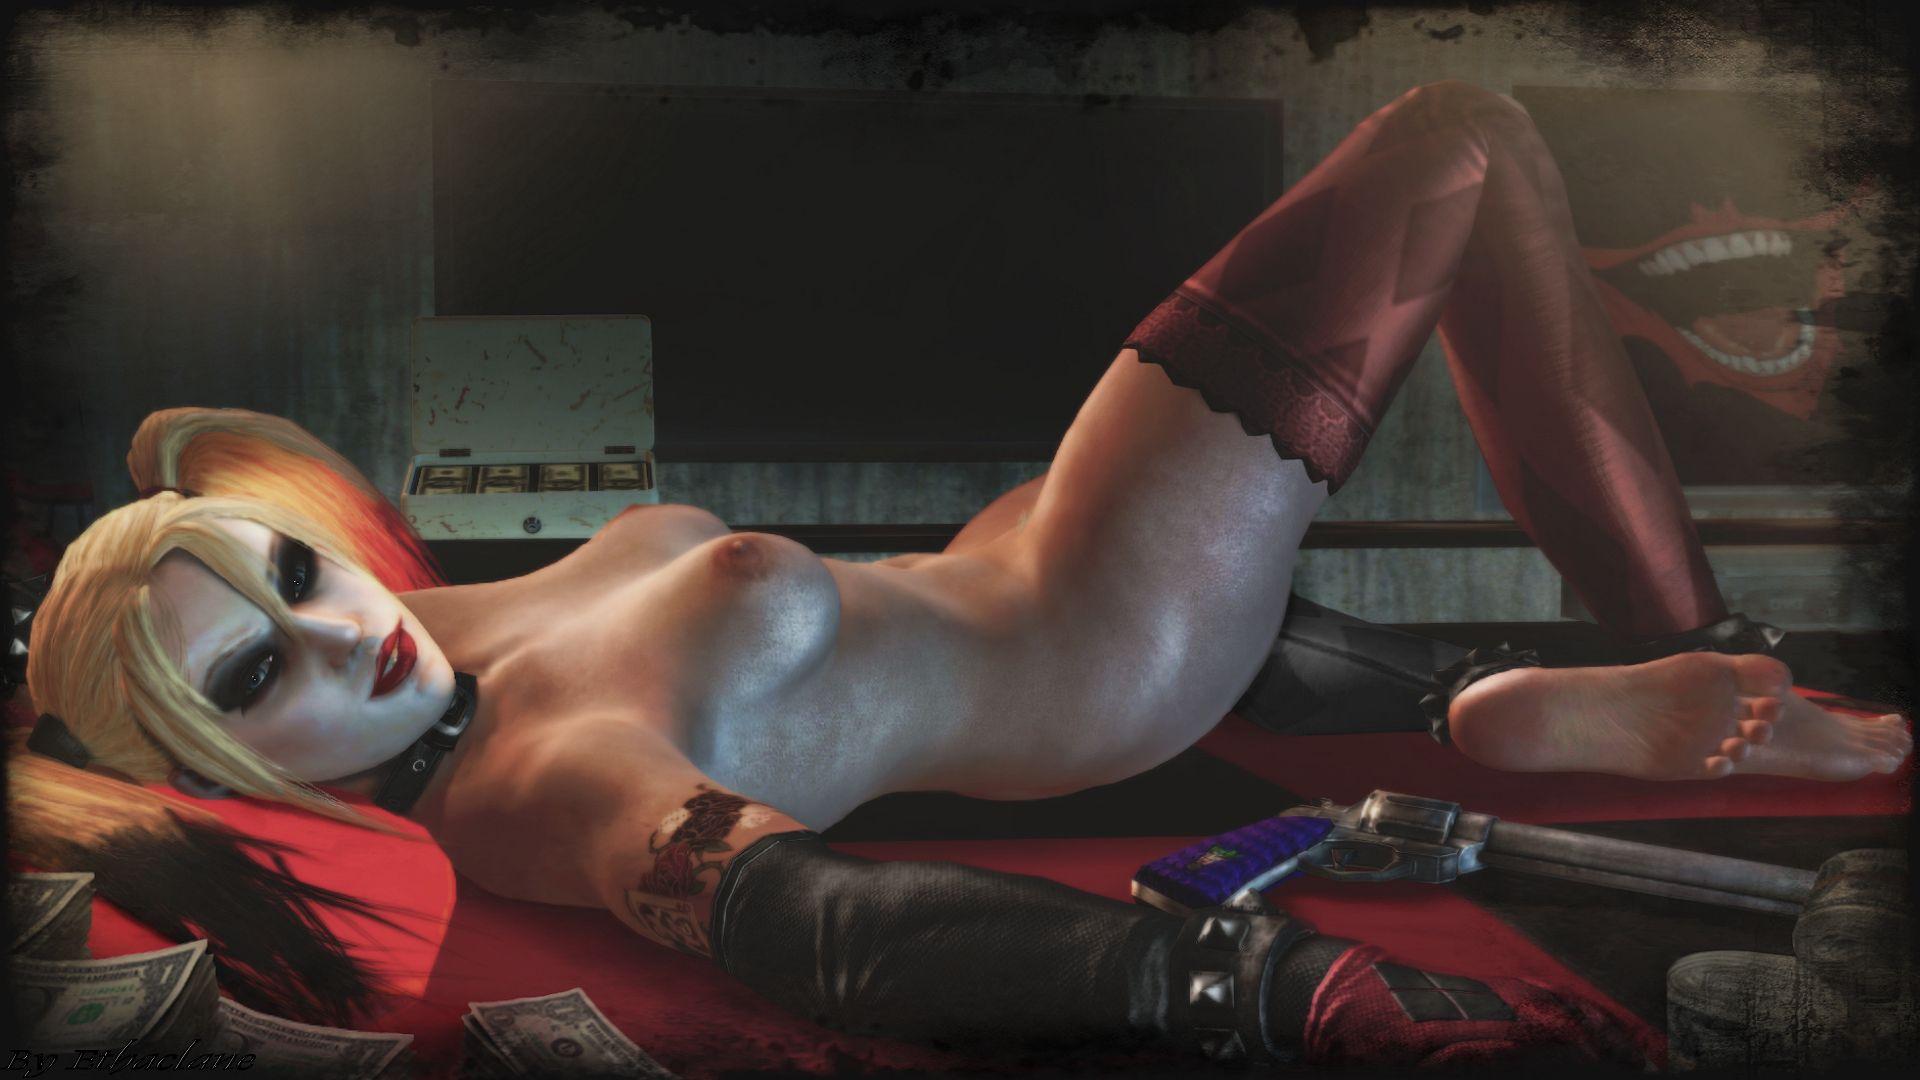 finlyandiya-filmi-eroticheskie